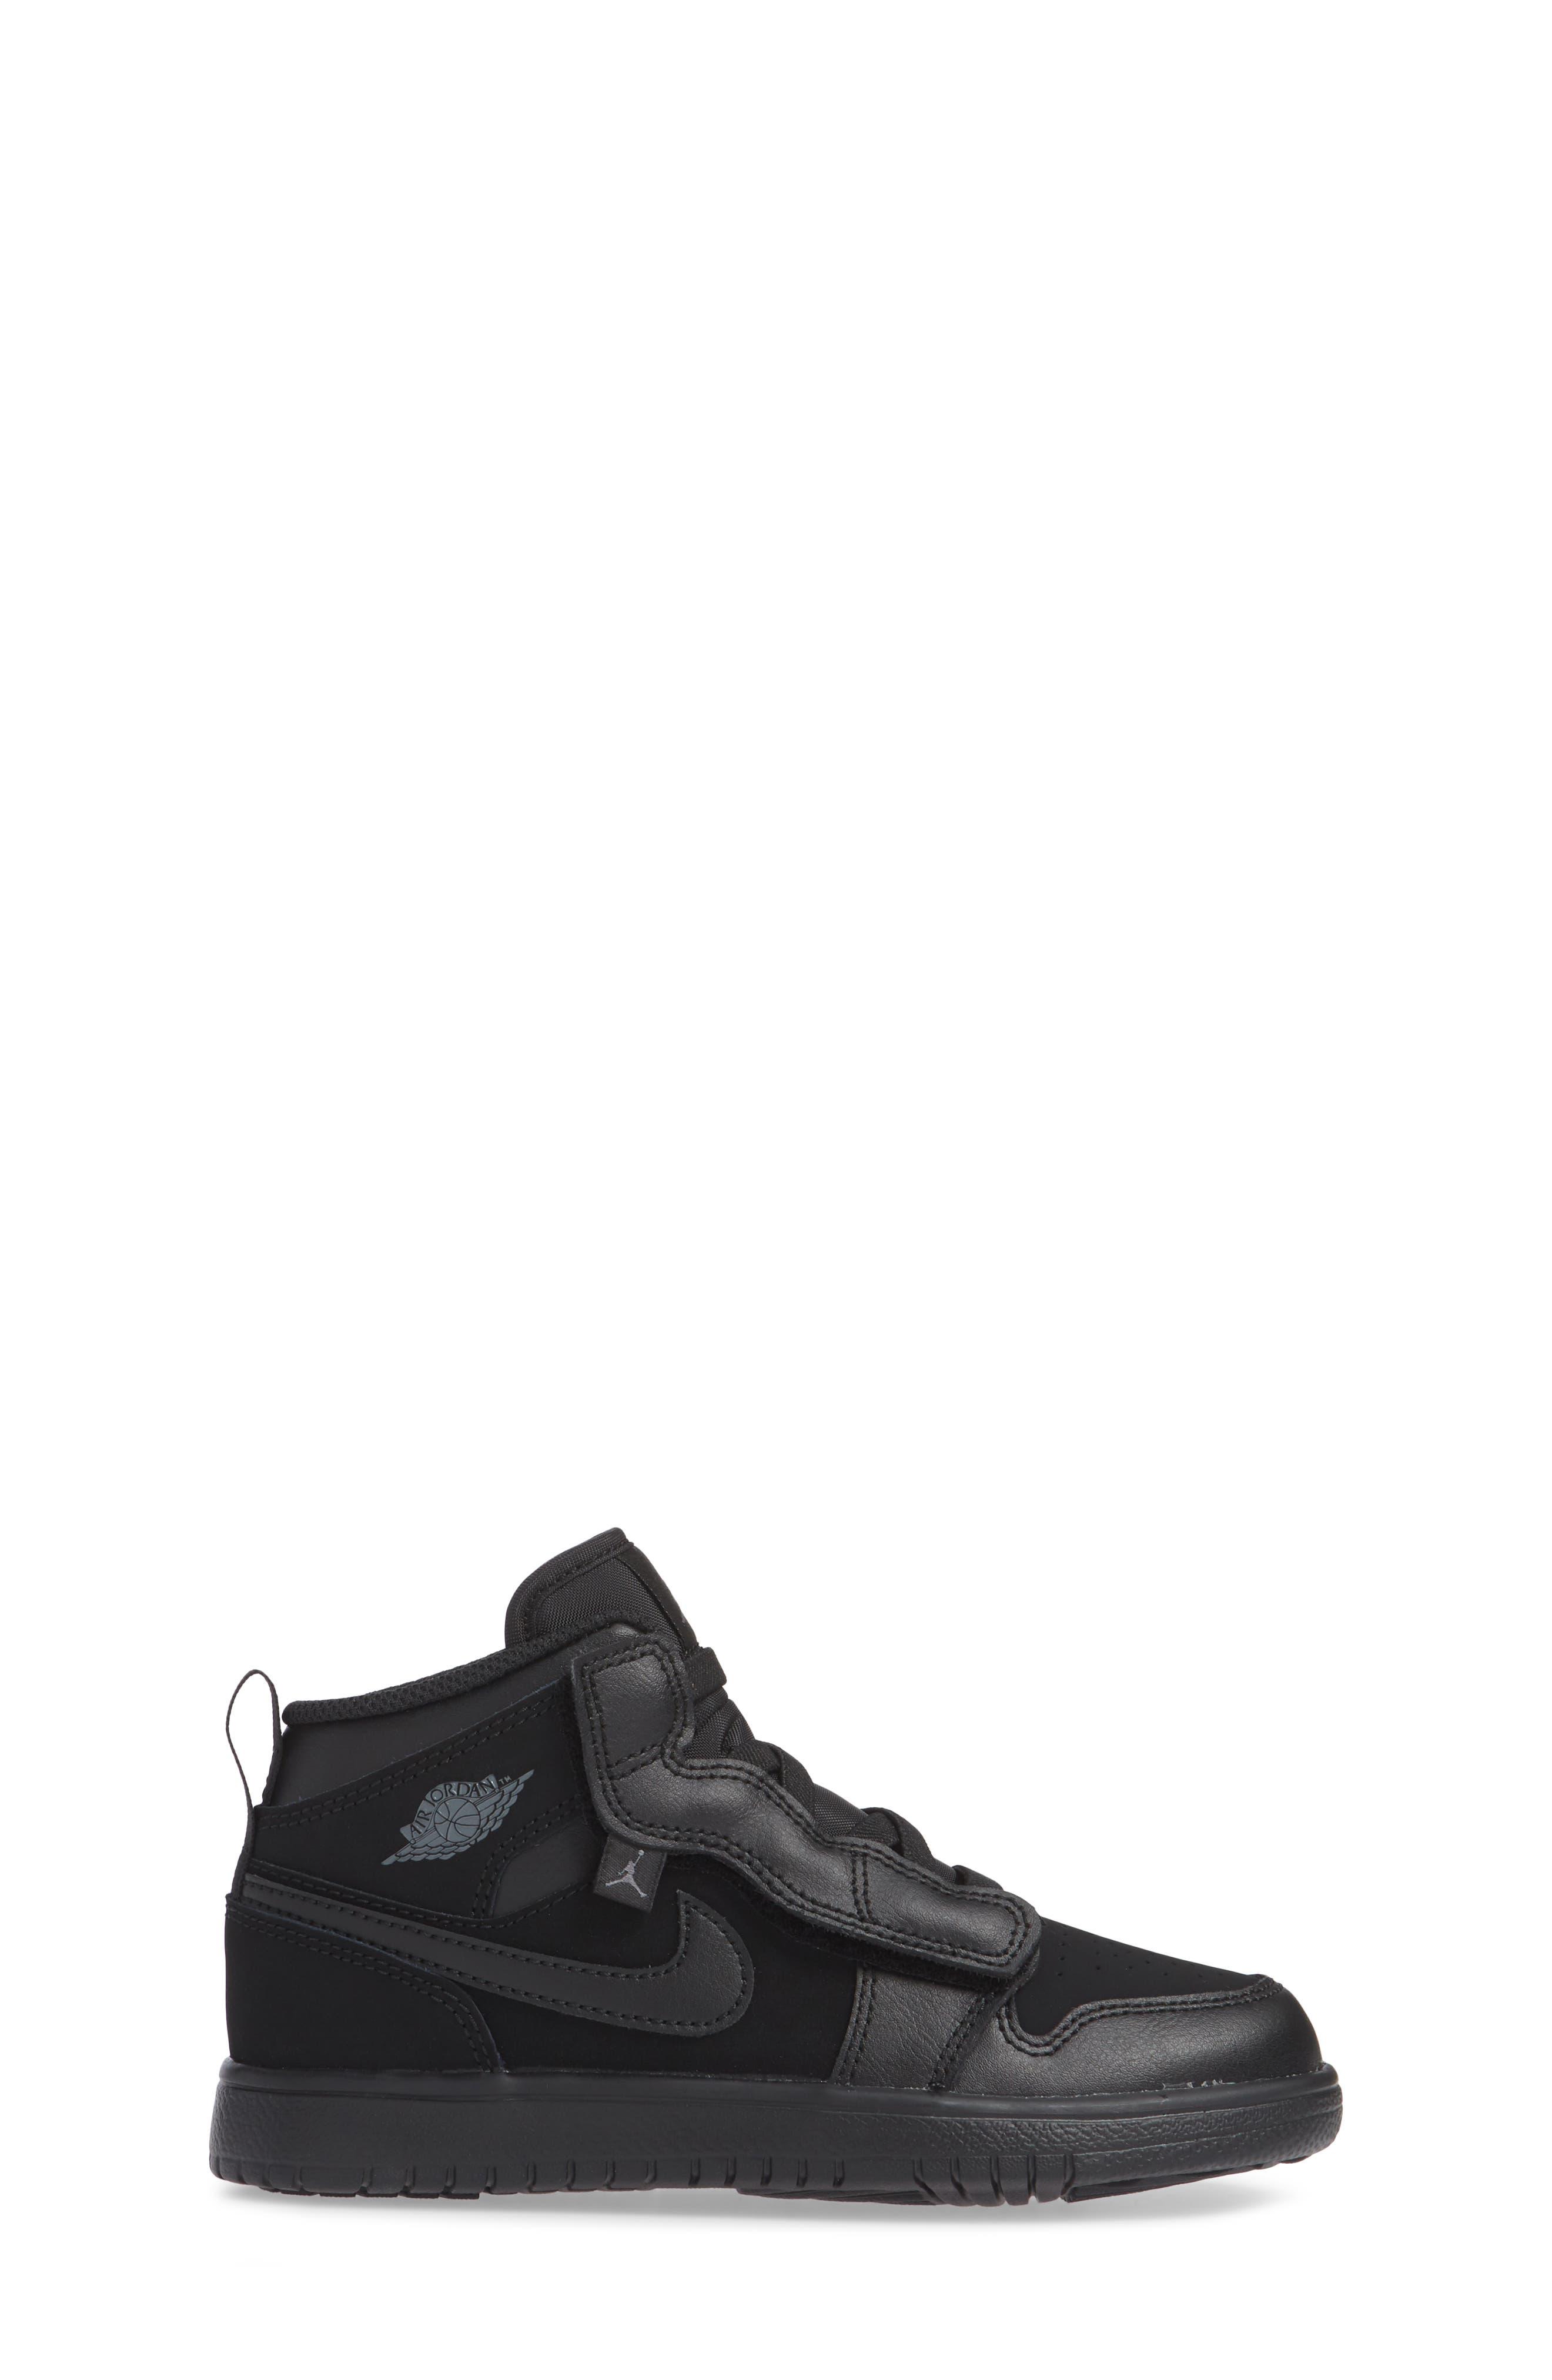 JORDAN, 1 Mid Basketball Shoe, Alternate thumbnail 3, color, BLACK/ DARK GREY